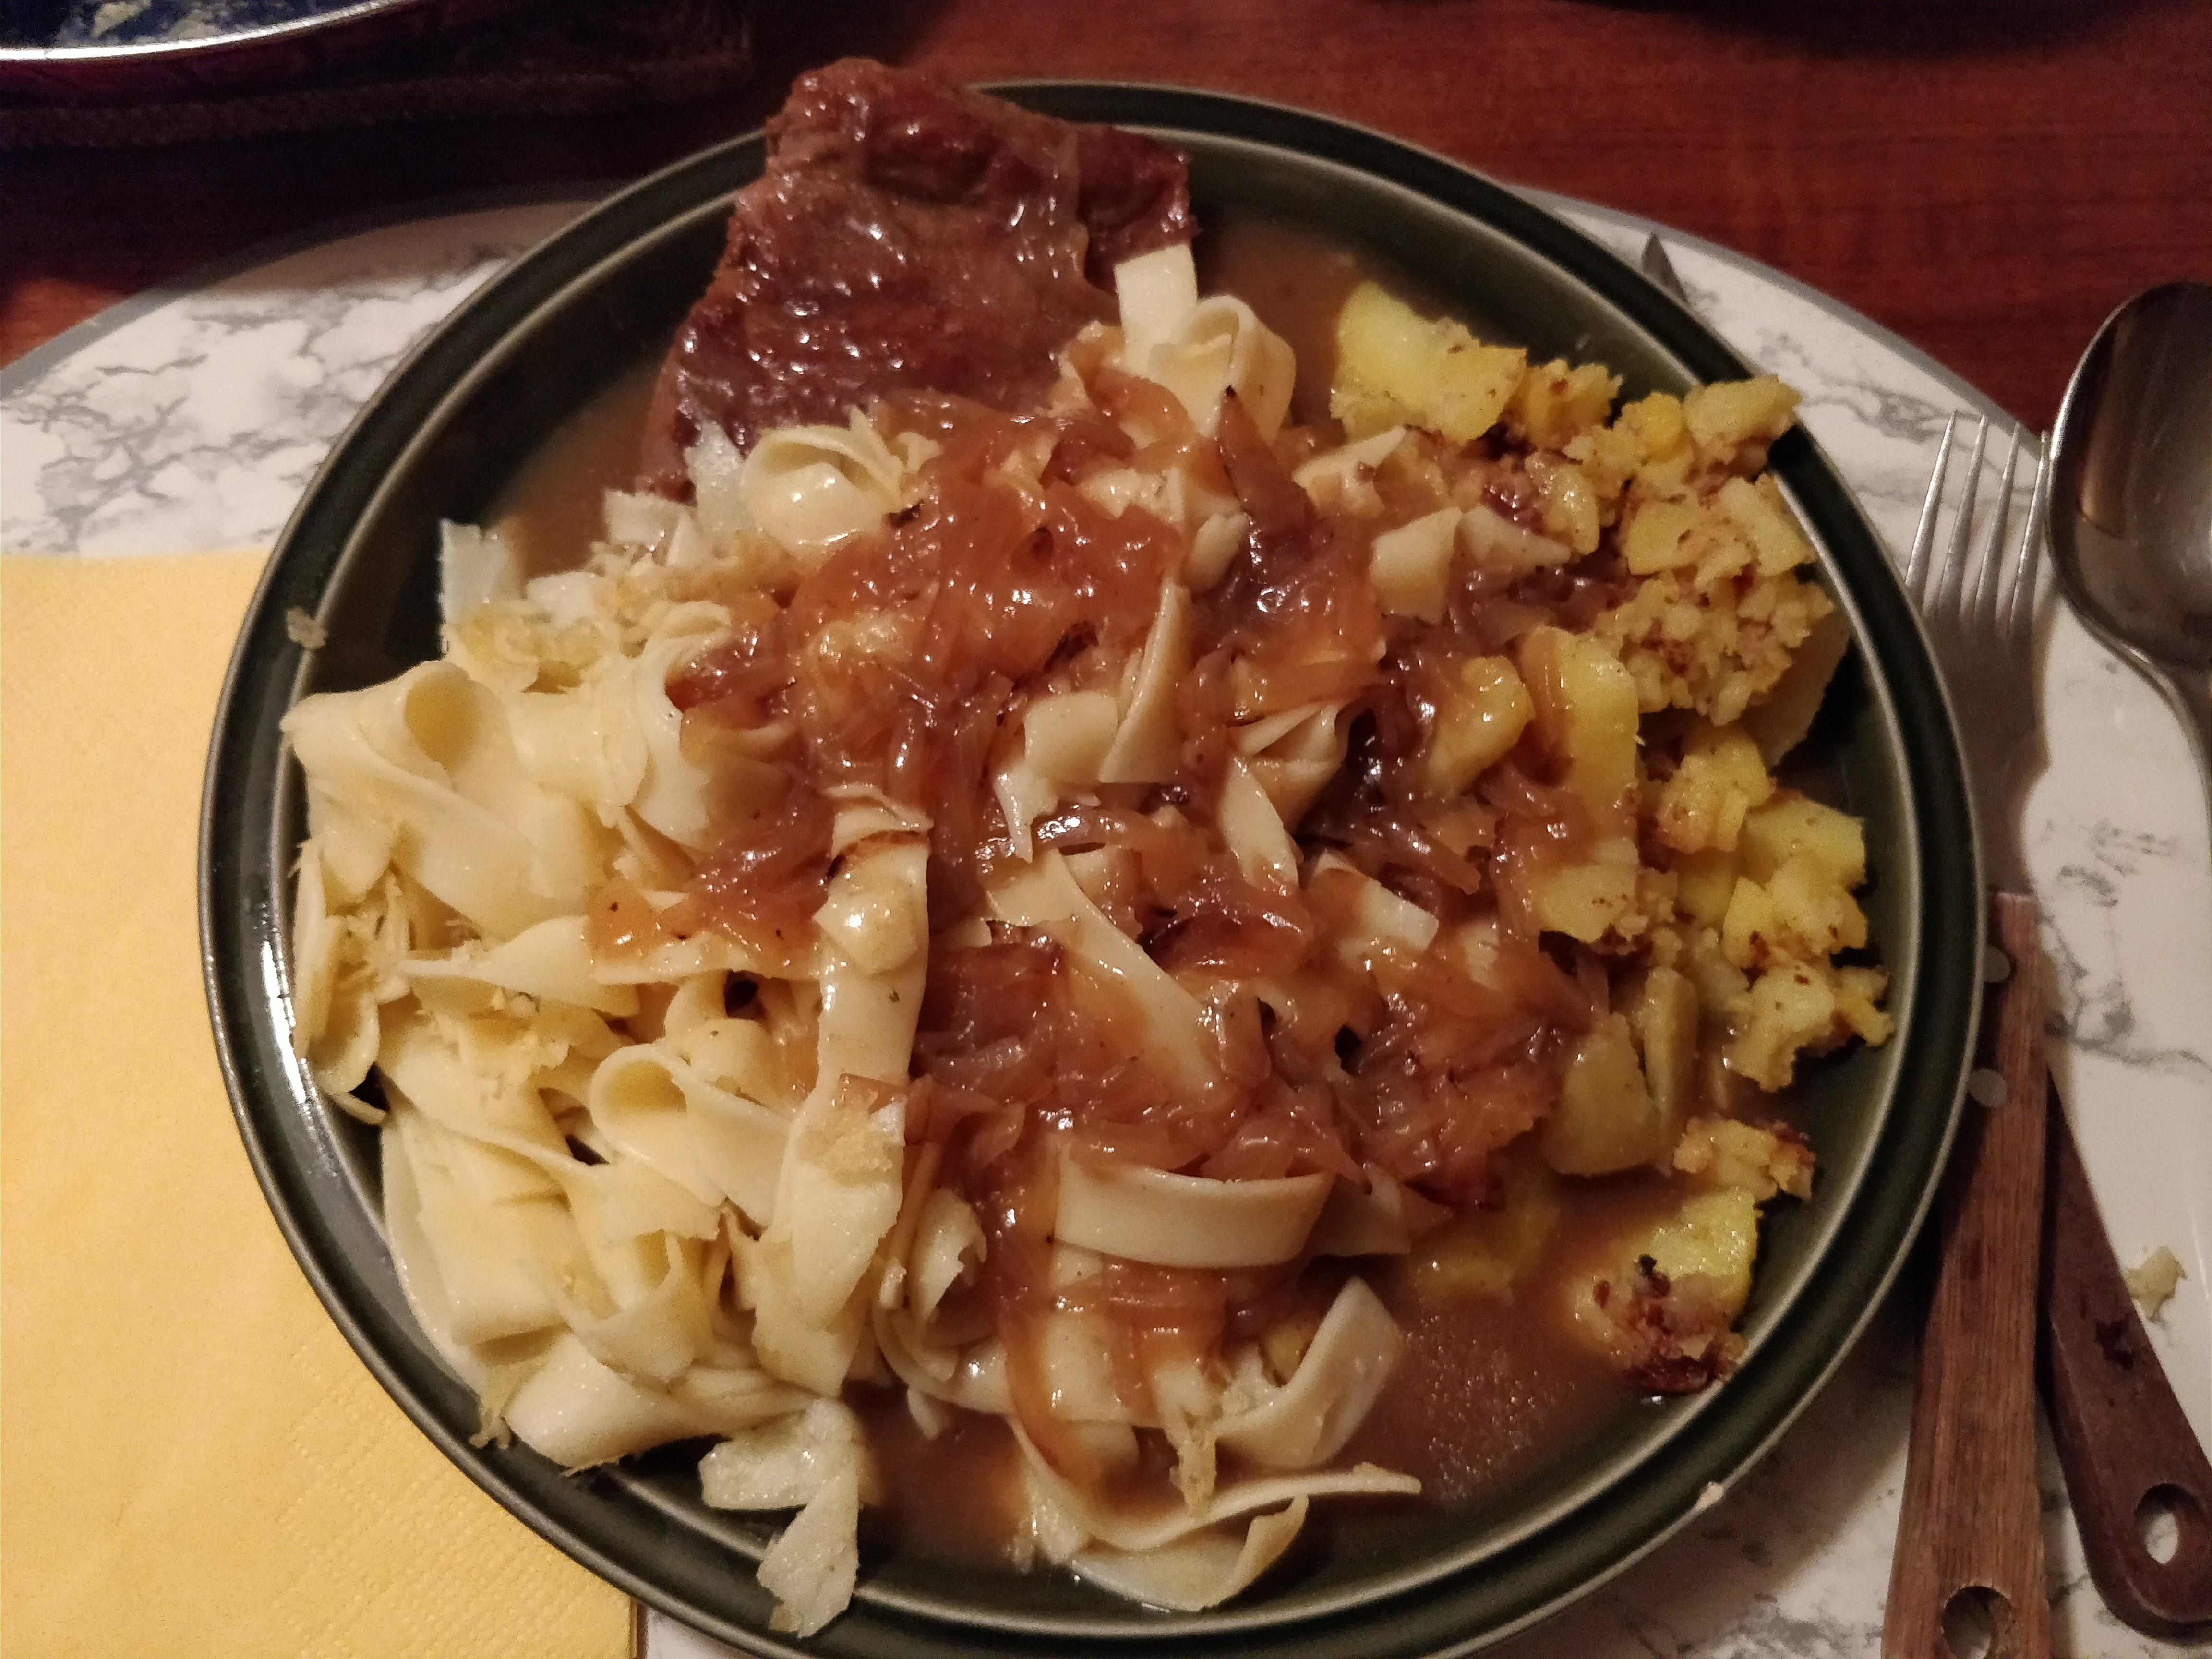 http://foodloader.net/nico_2018-01-17_rostbraten-nudeln-bratkartoffeln.jpg